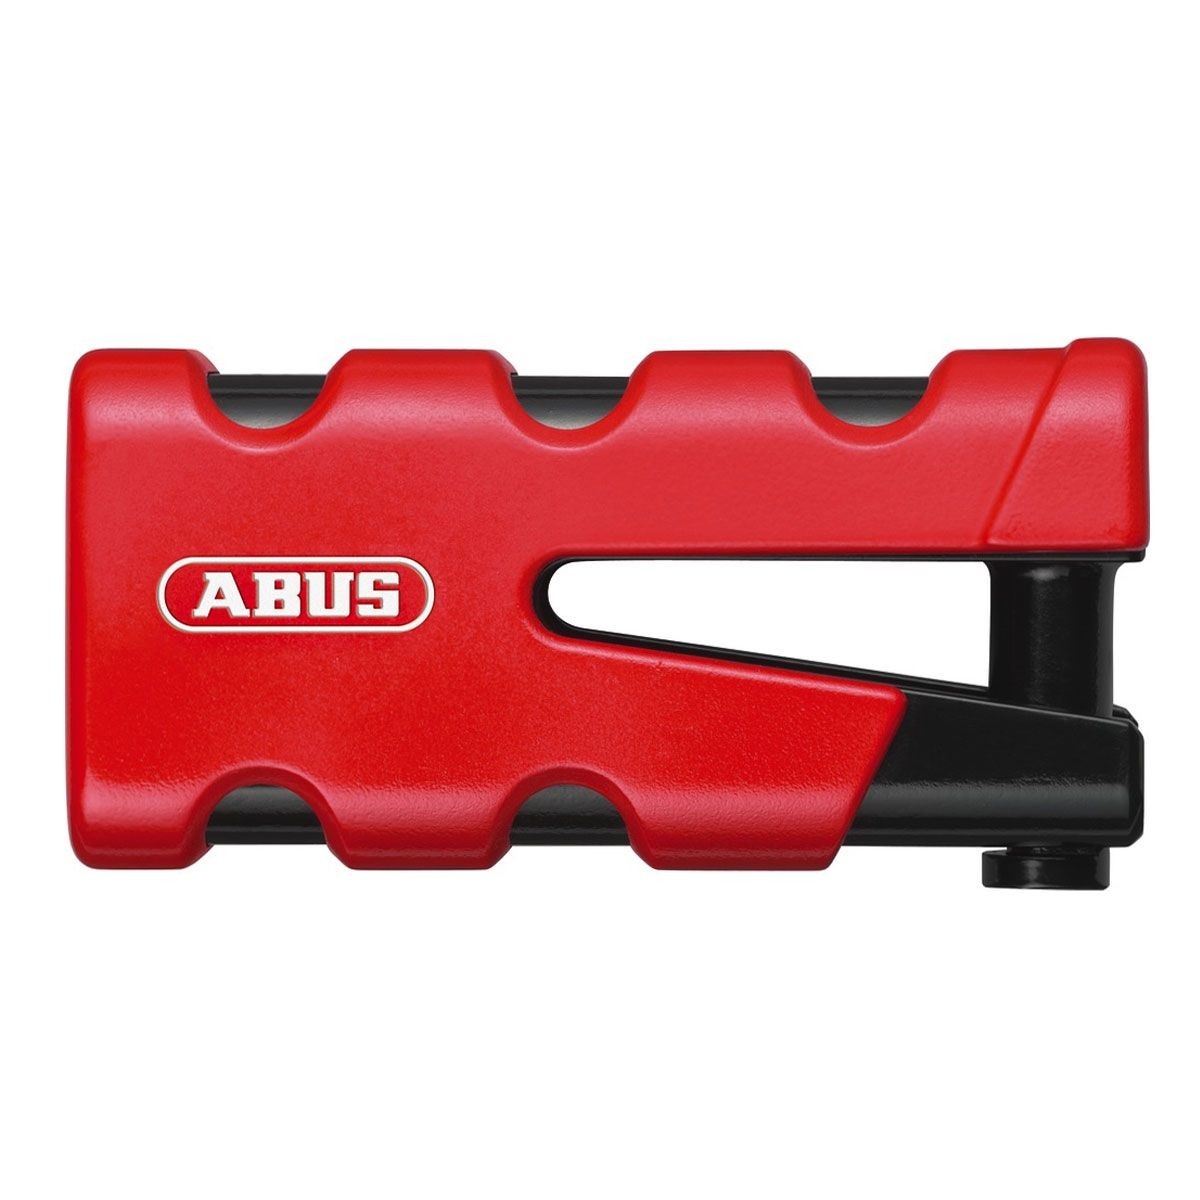 ABUS Disclock 77 granit sledg grip red